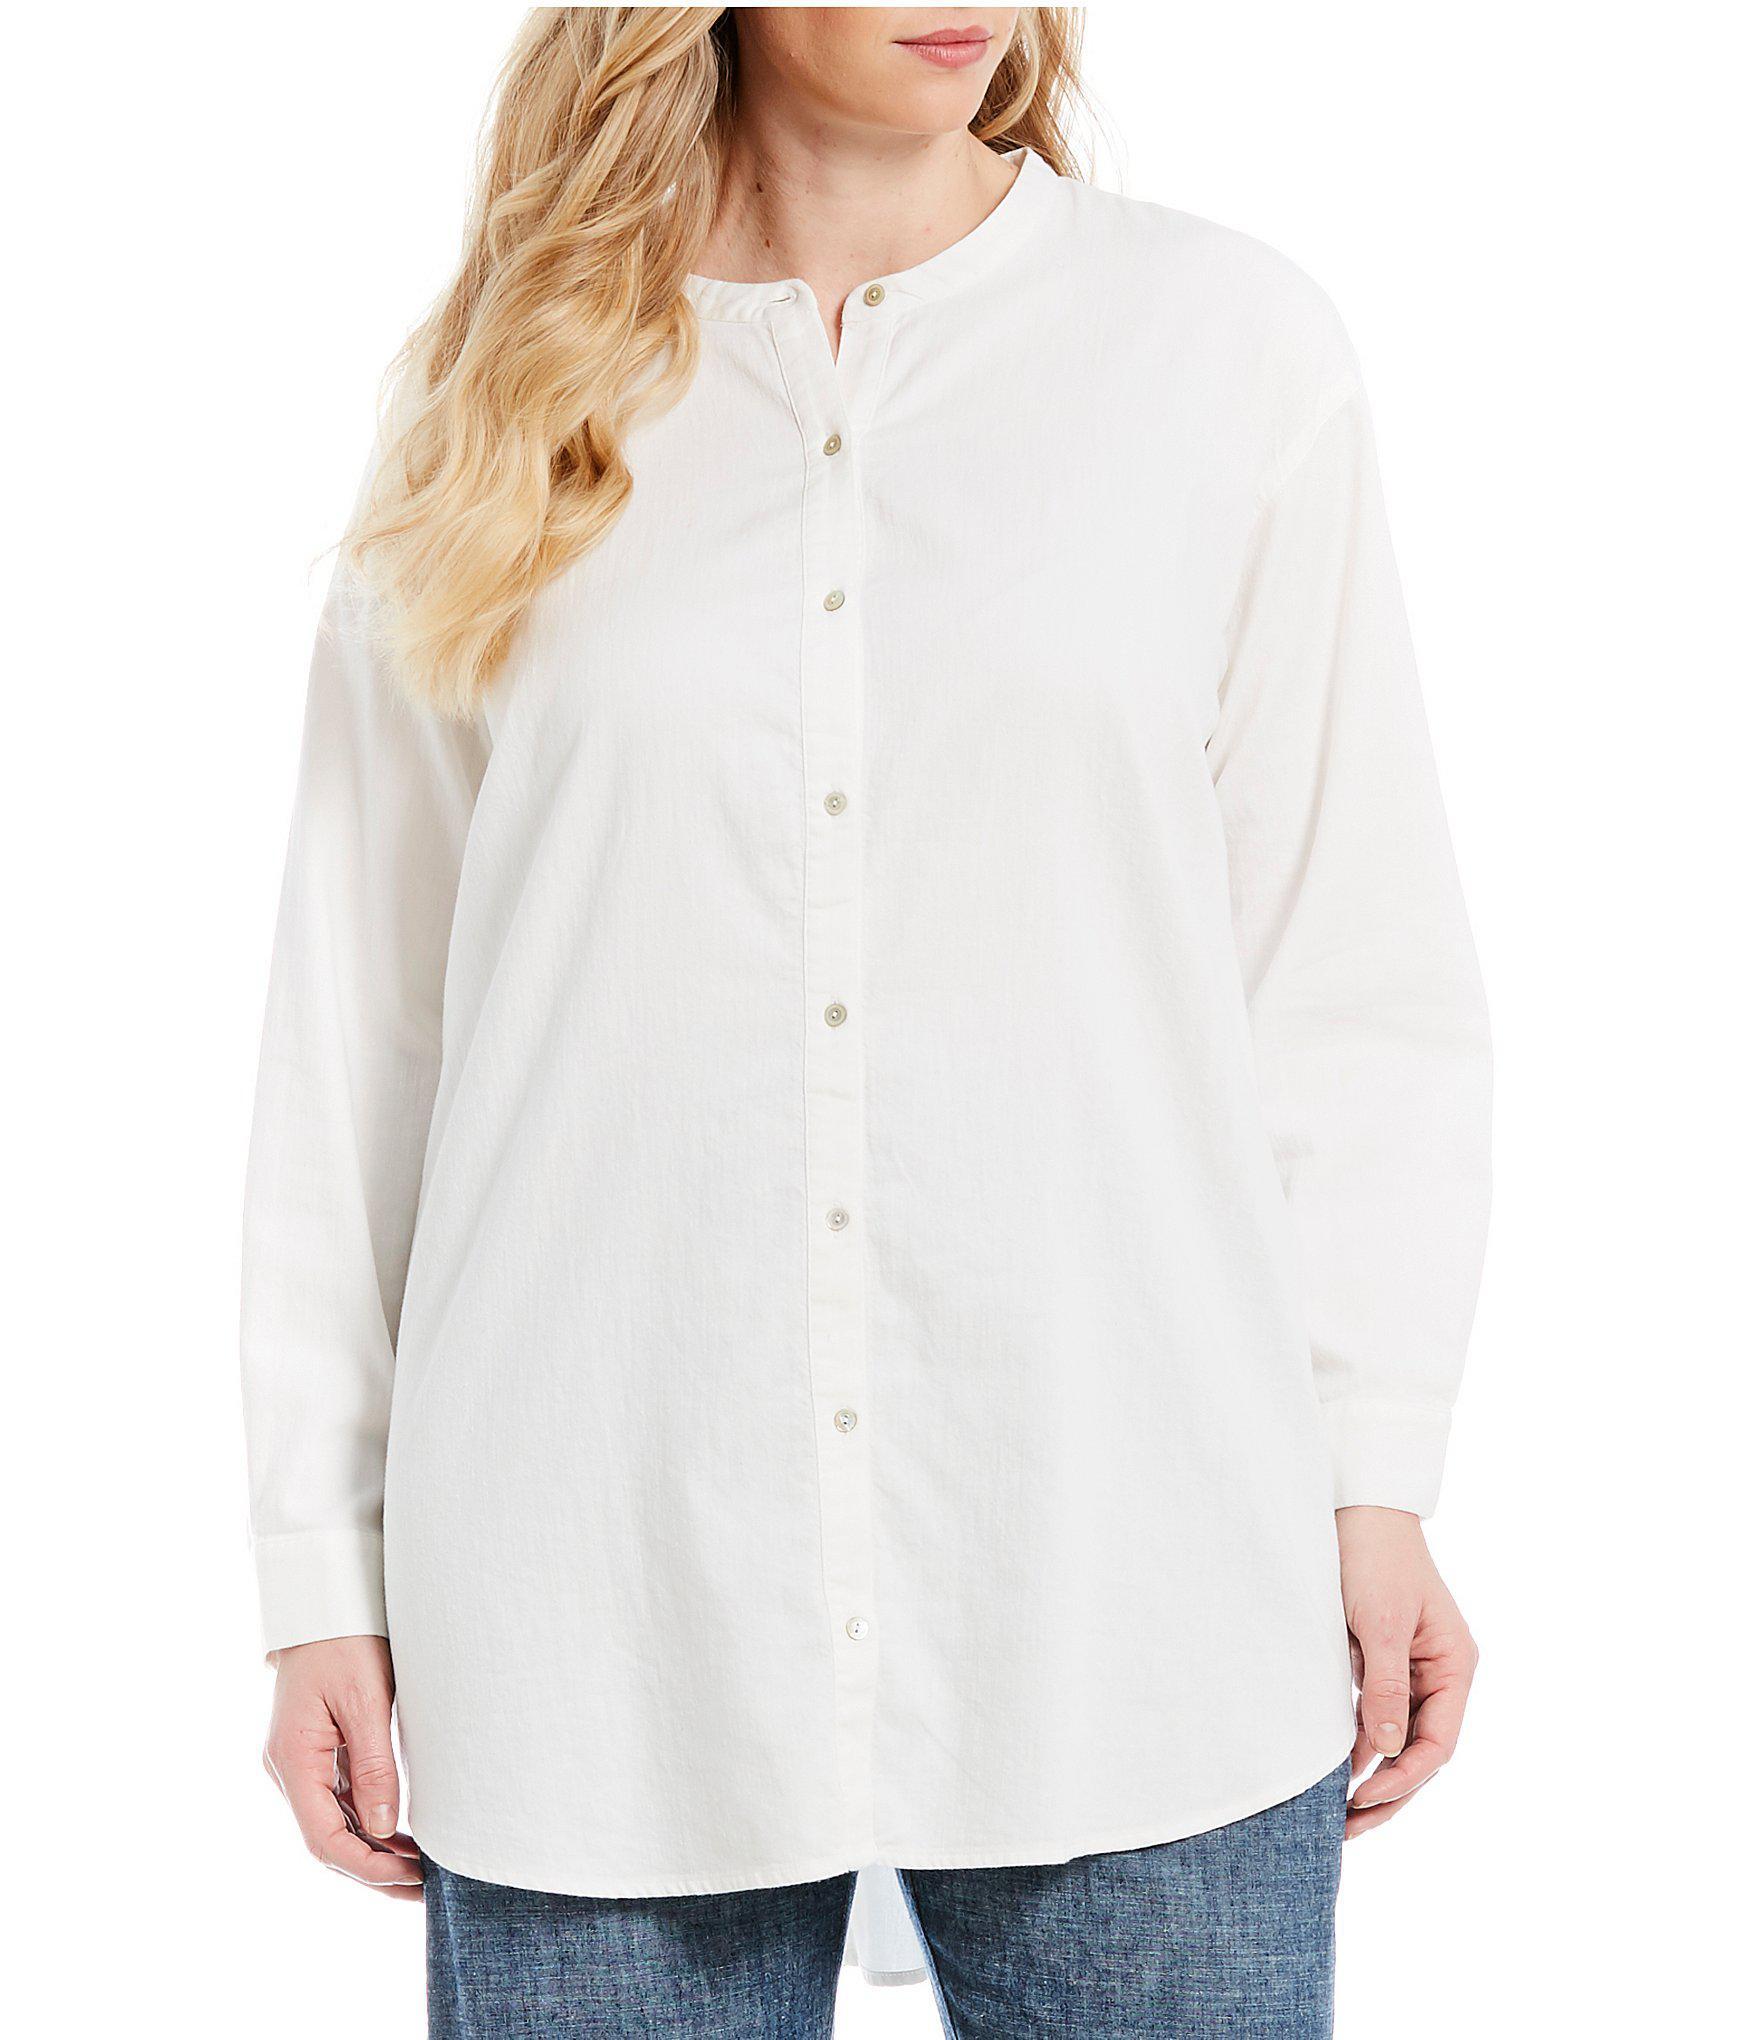 9c421d2349c Eileen Fisher. Women's White Plus Size Mandarin Collar Button Front Shirt